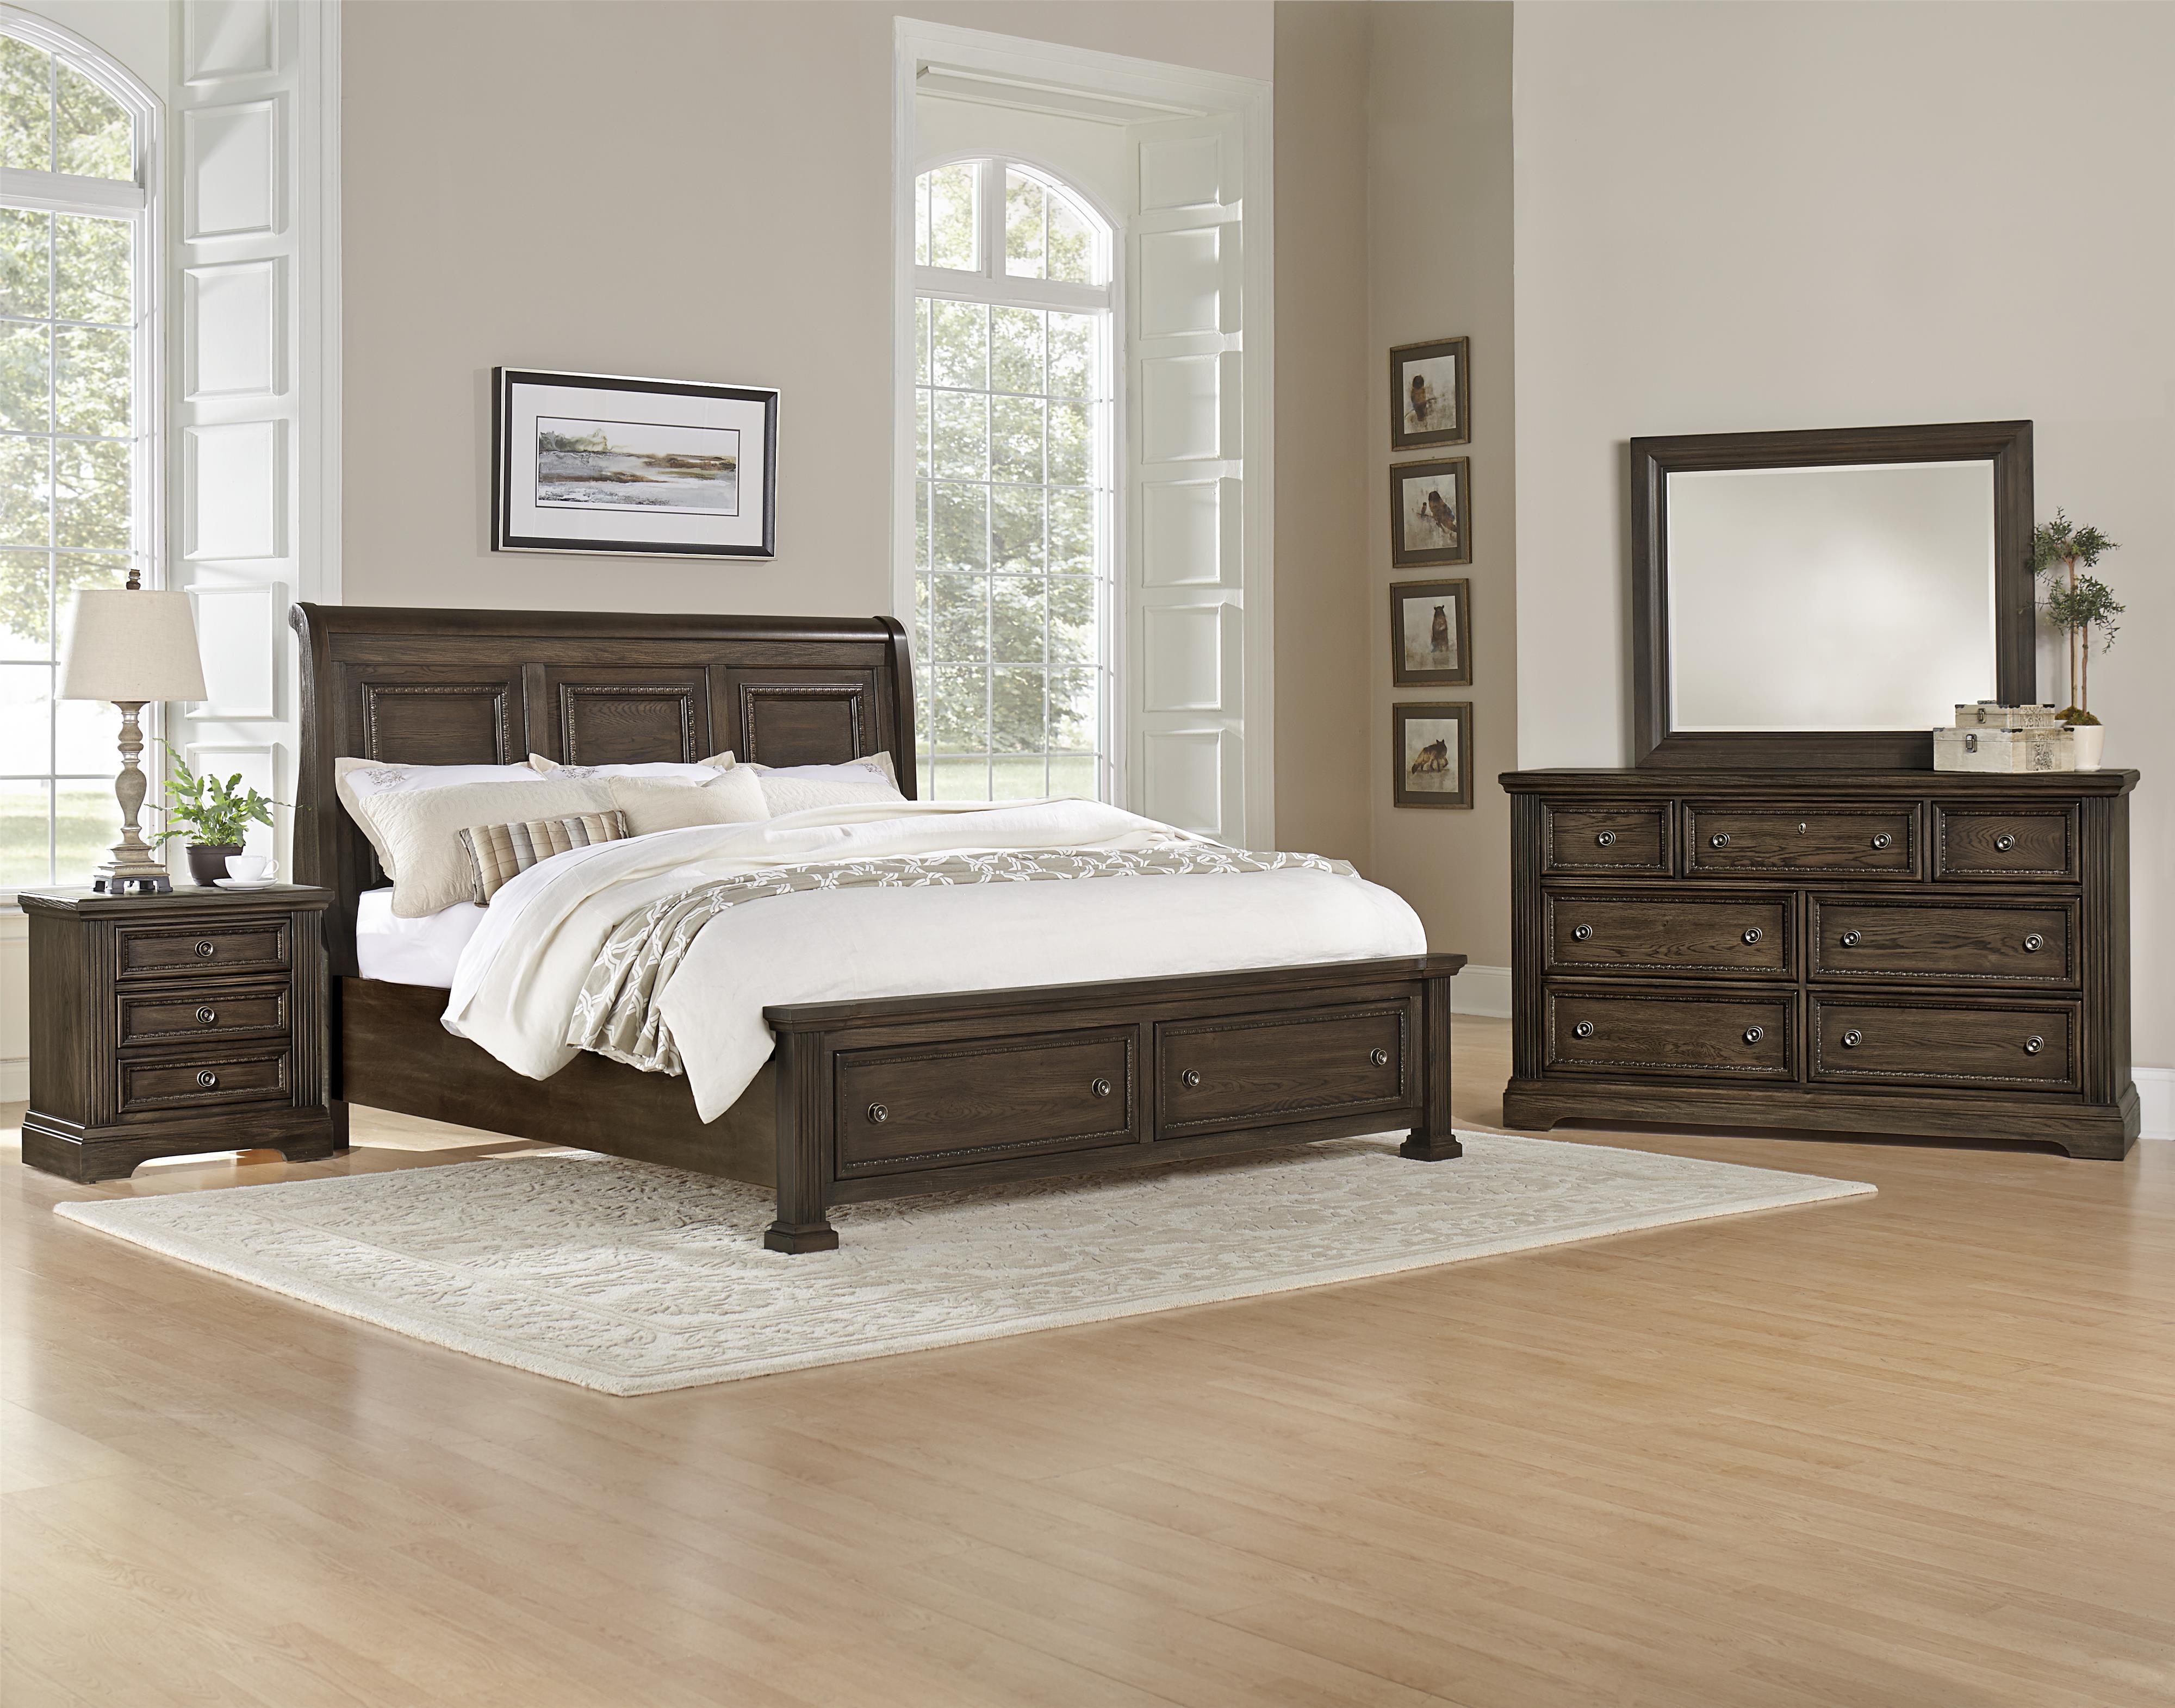 Vaughan Bassett Affinity King Bedroom Group - Item Number: 560 K Bedroom Group 4